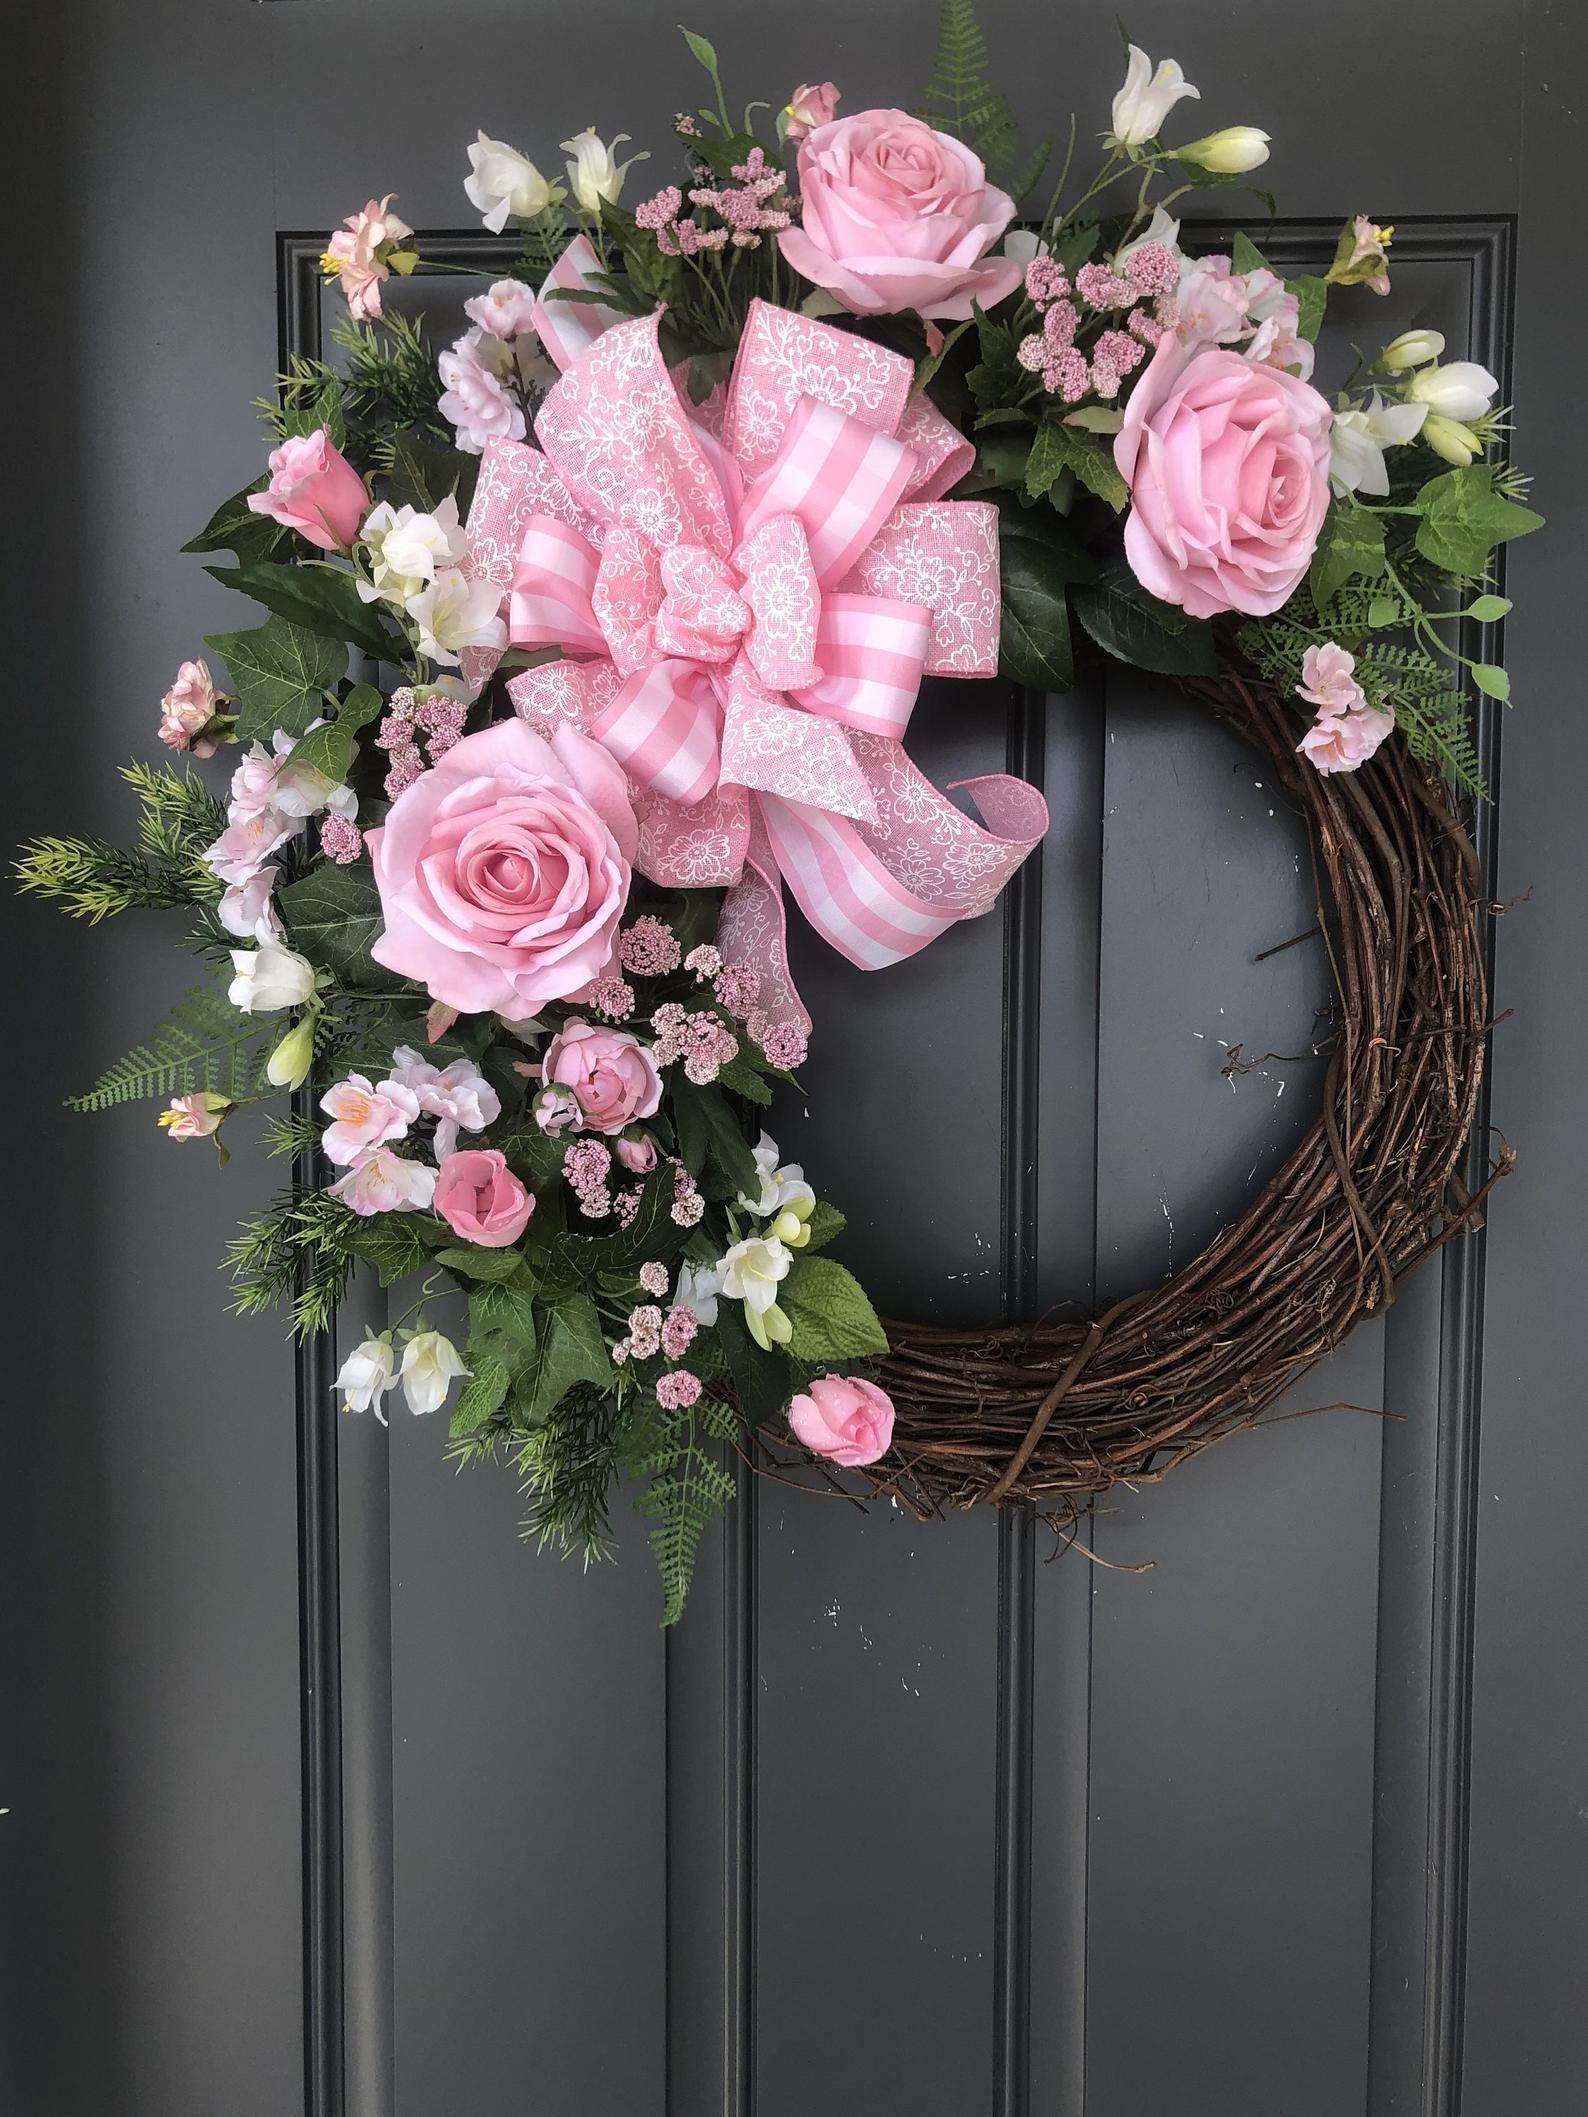 Roses,Pink Roses,Rose Floral,Pink Rose Floral,Pink Rose Floral Grapevine,Summer Pink Rose Door Decor,Summer Pink Rose Wall Decor,Pink Roses